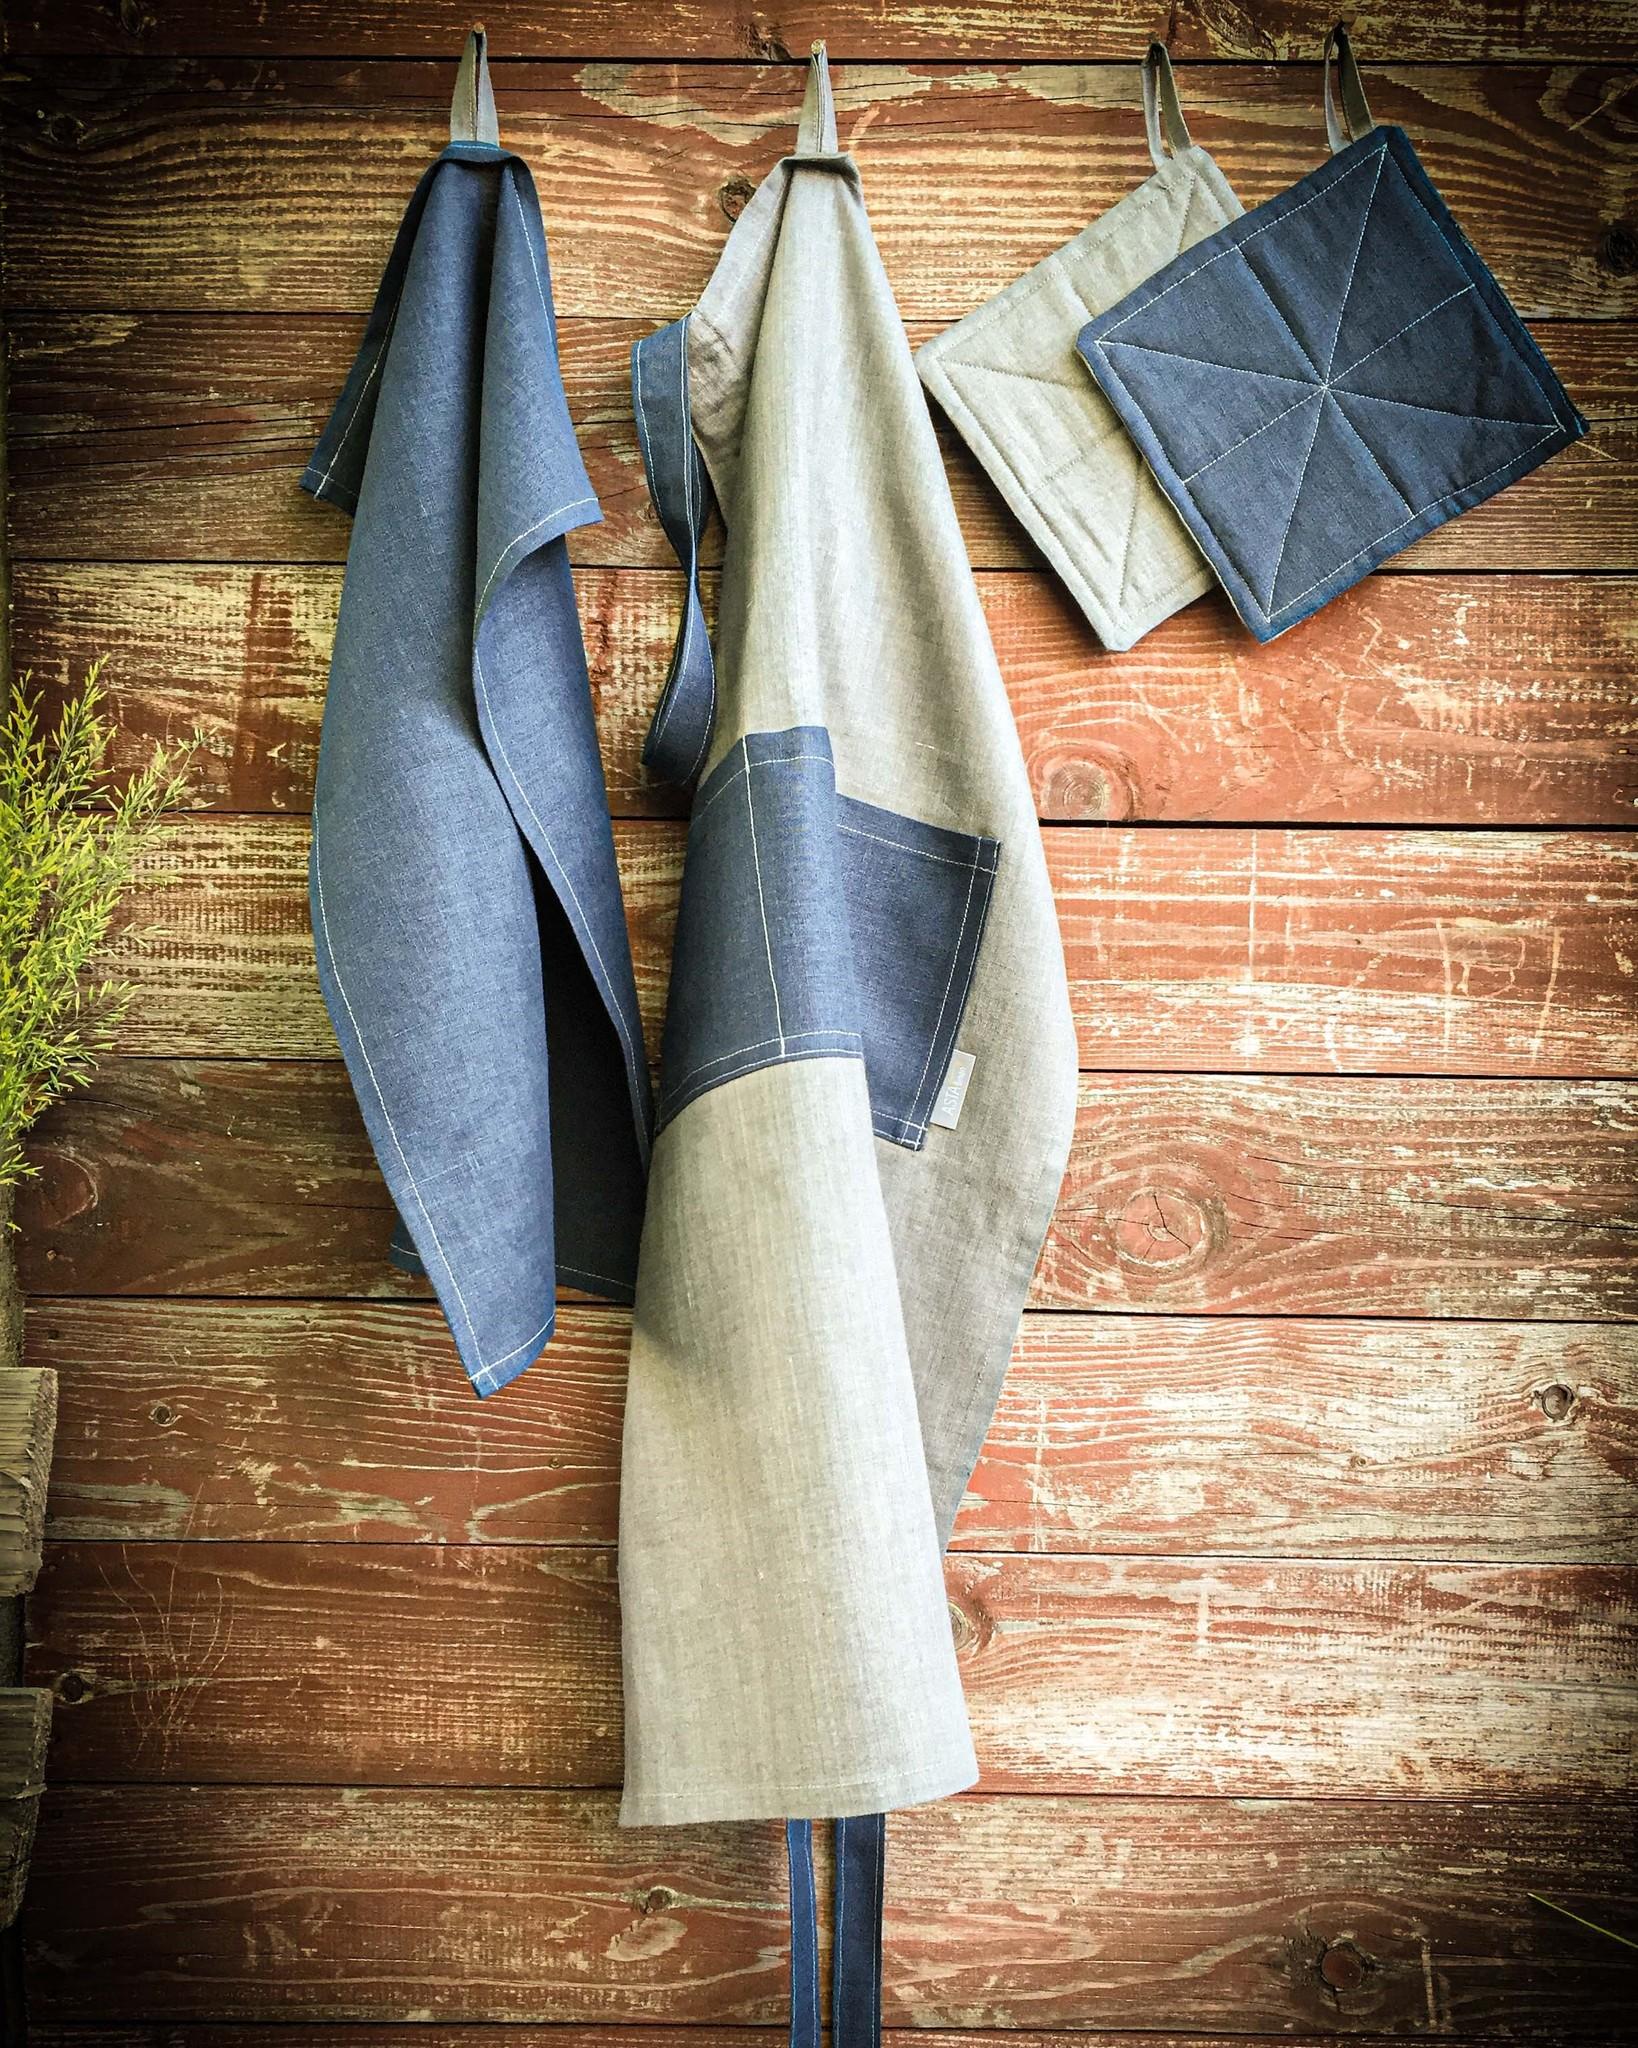 Набор для барбекю - фартук, полотенце, прихватки